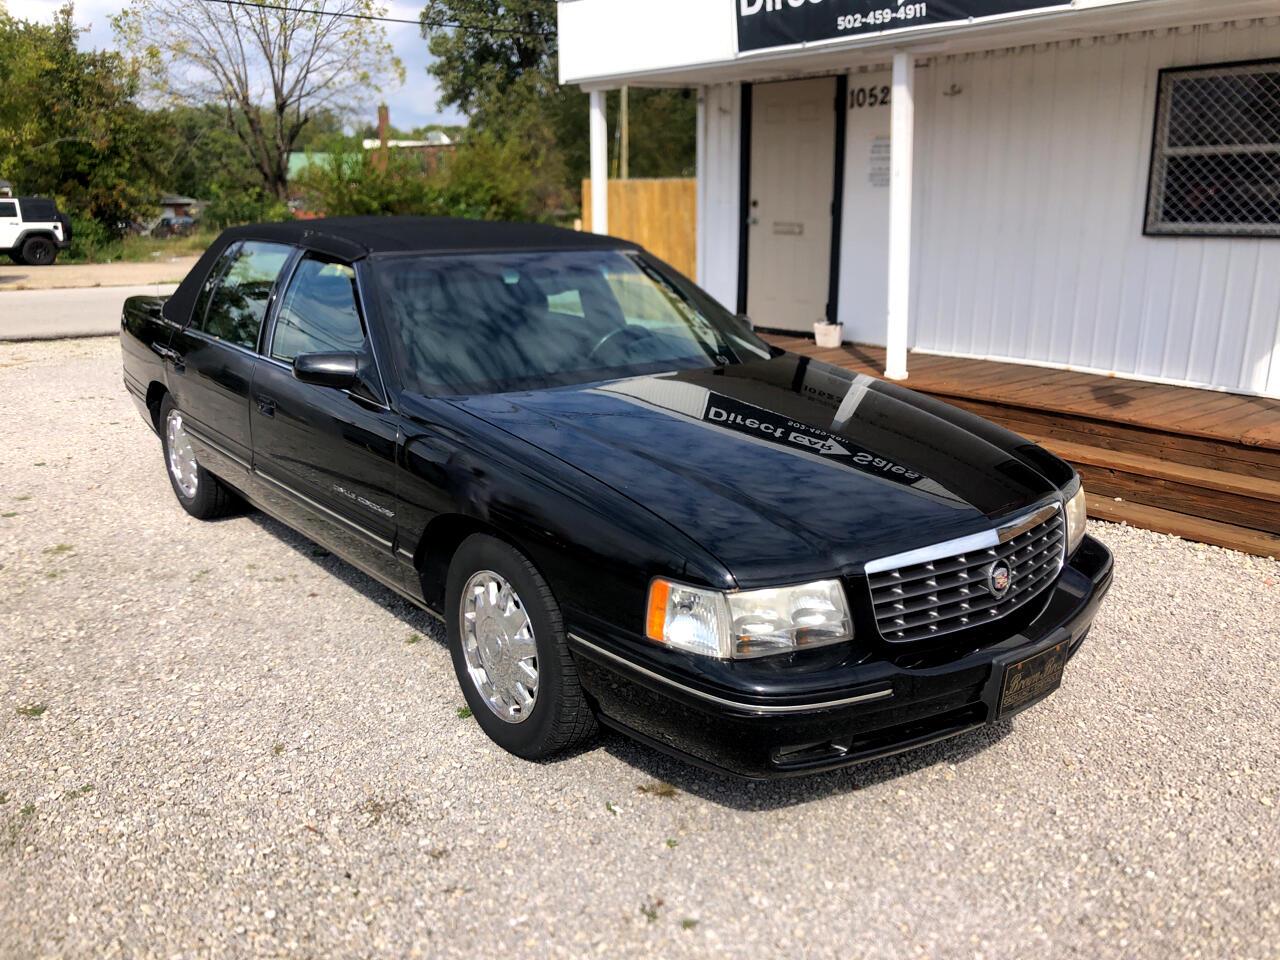 Cadillac DeVille Concours 1999